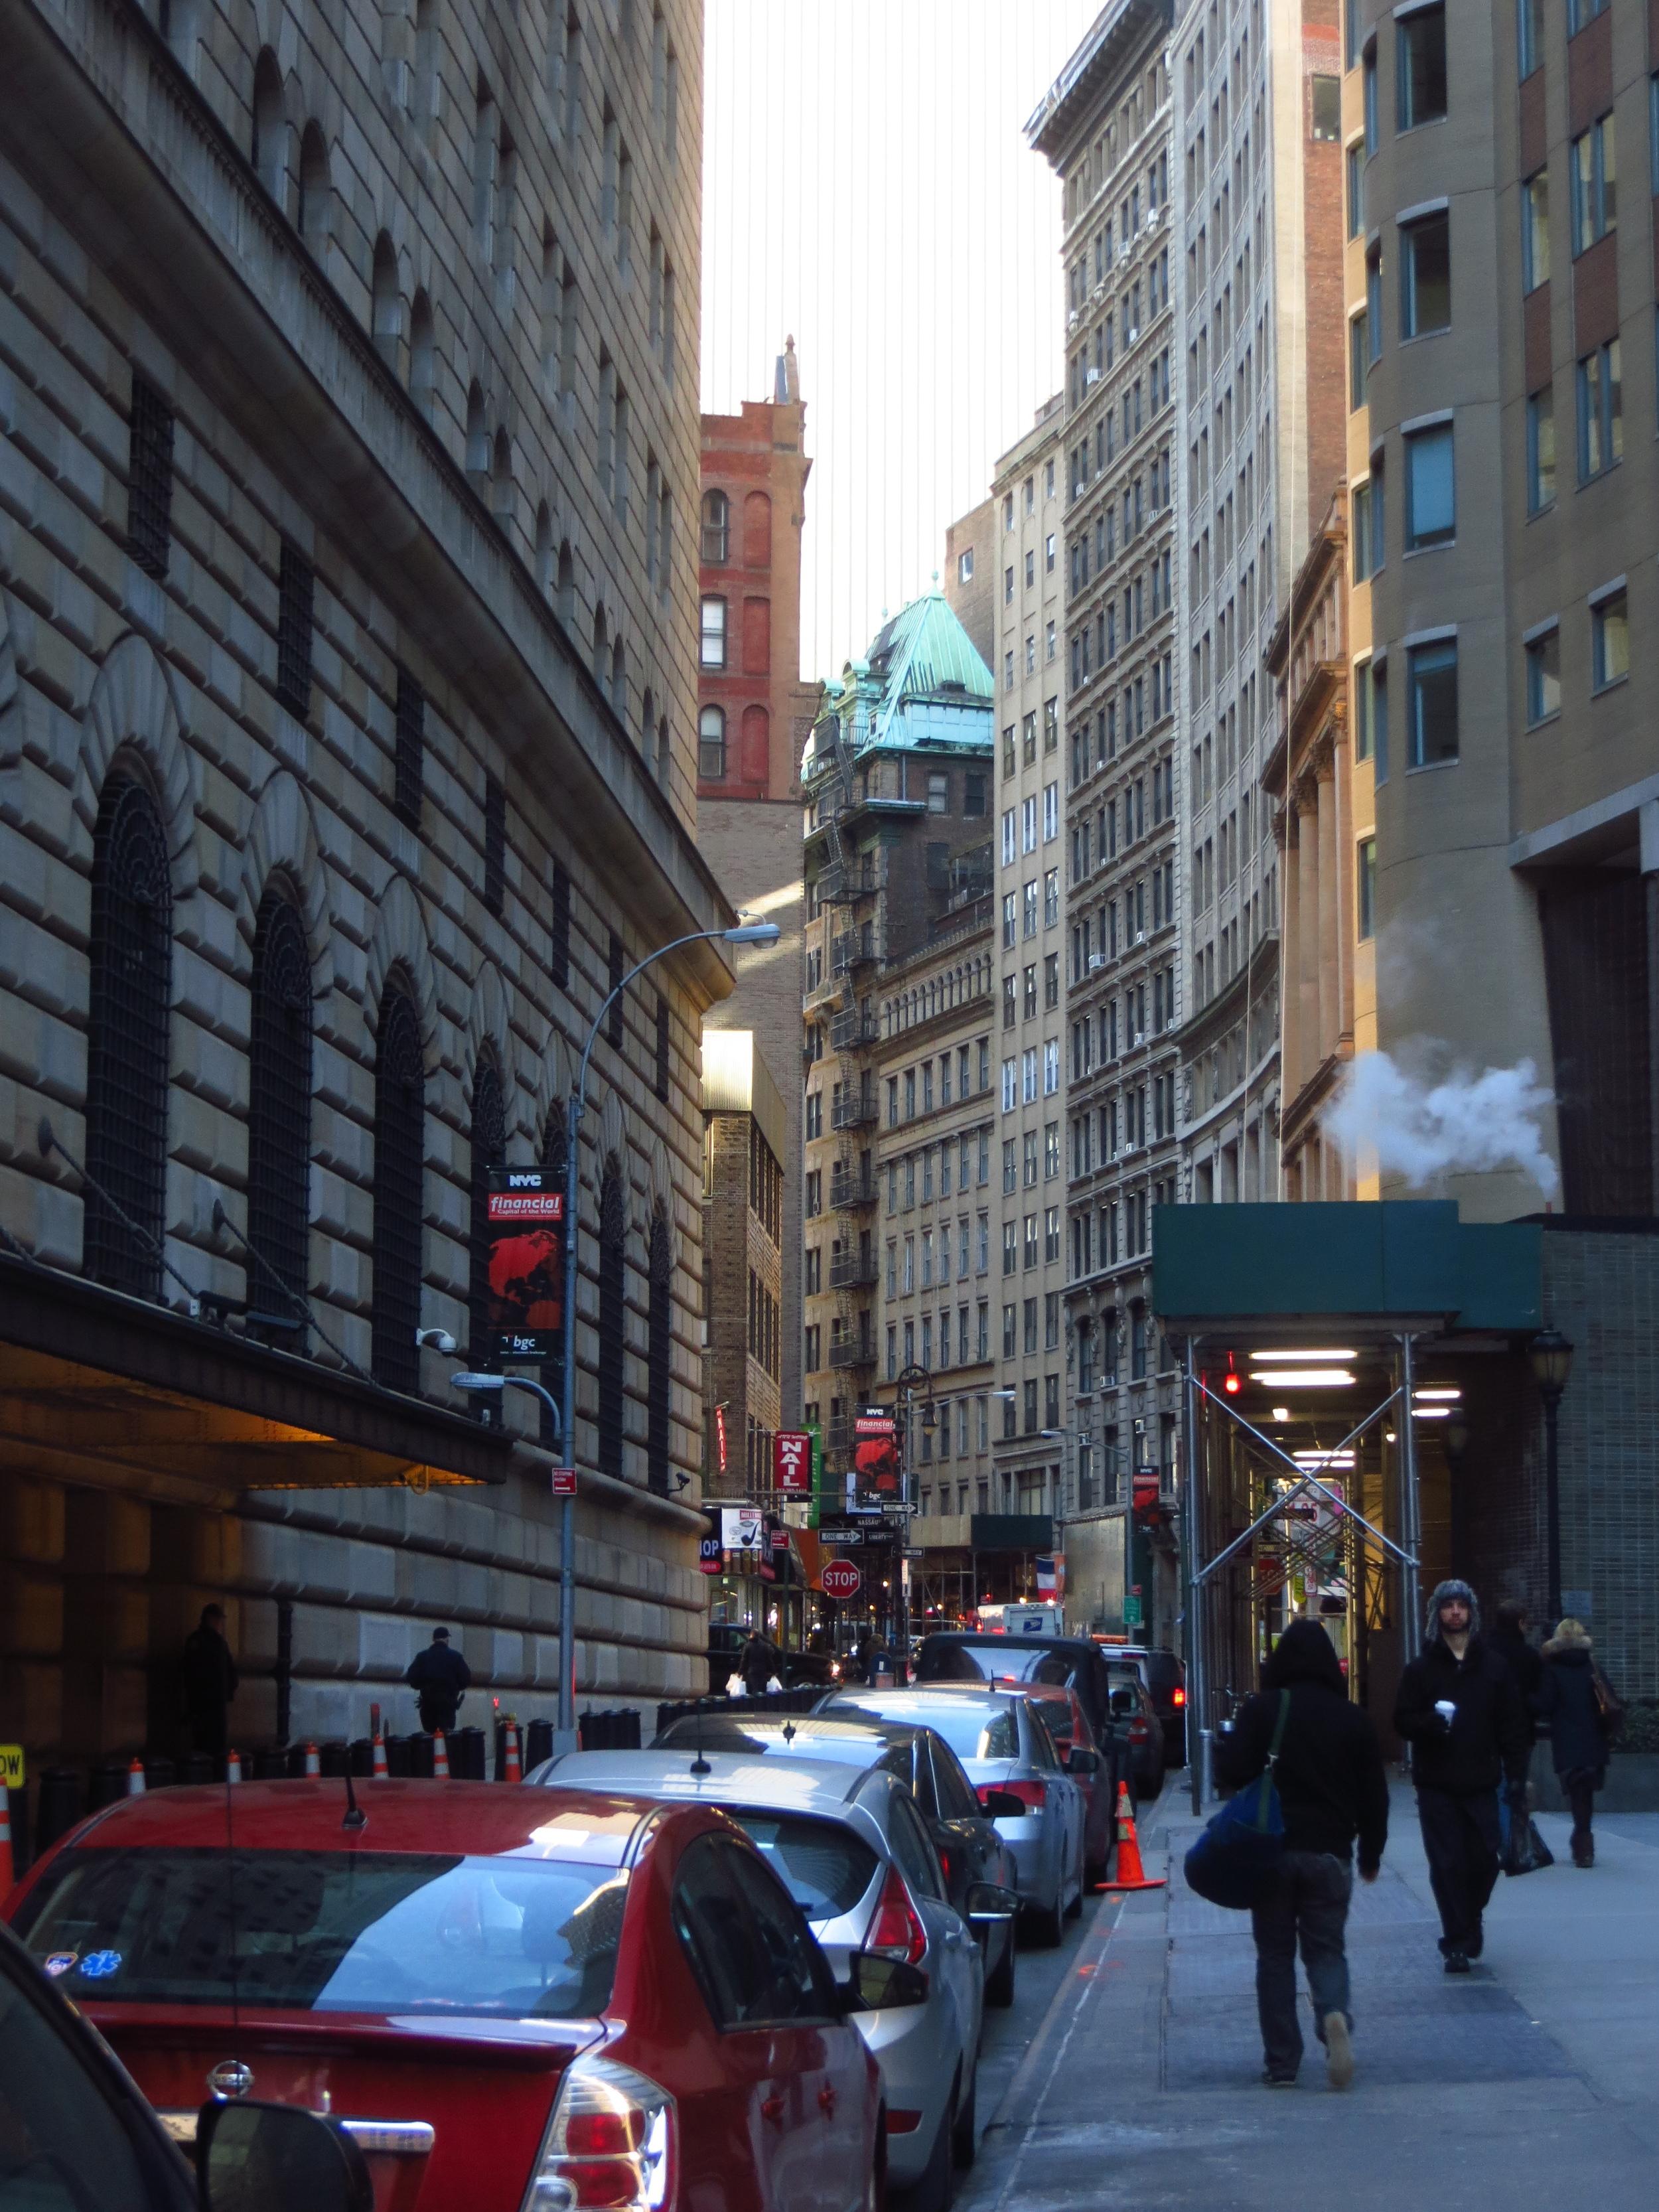 Typical narrow street in lower Manhattan